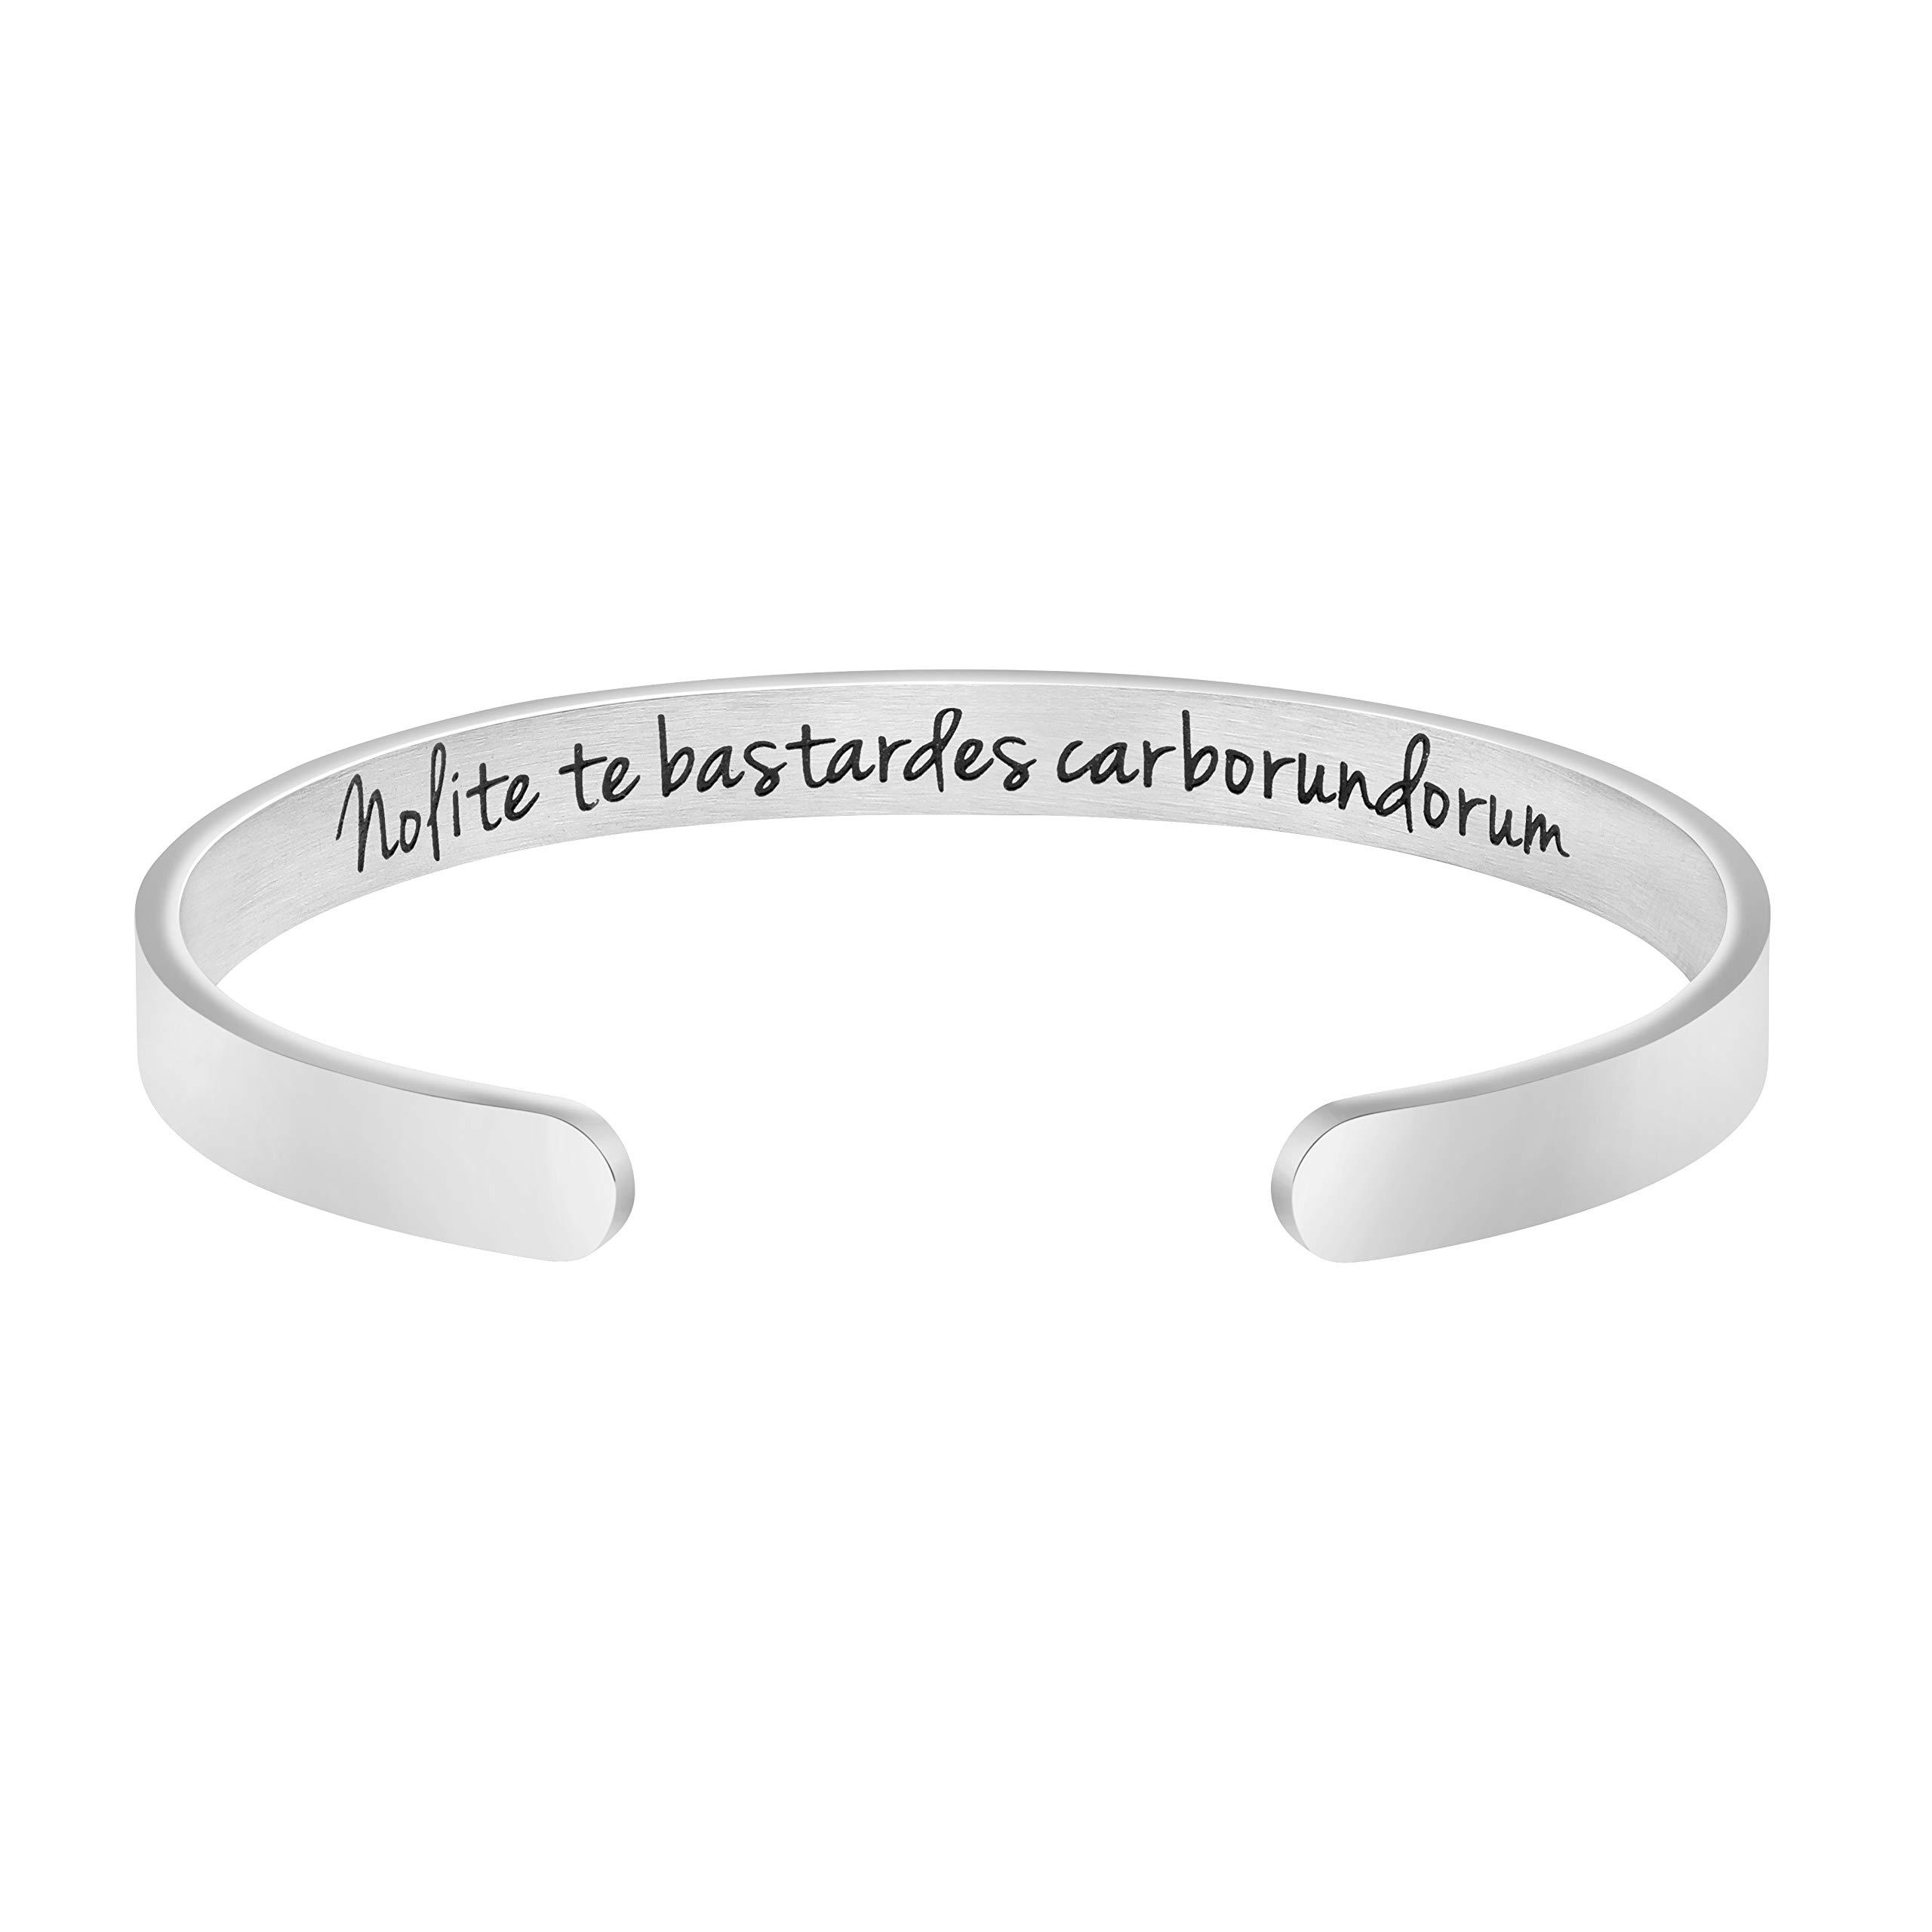 Joycuff Inspirational Mantra Cuff Bracelets for Women Friend Encouragement Gift for Her Personalized Birthday Jewelry